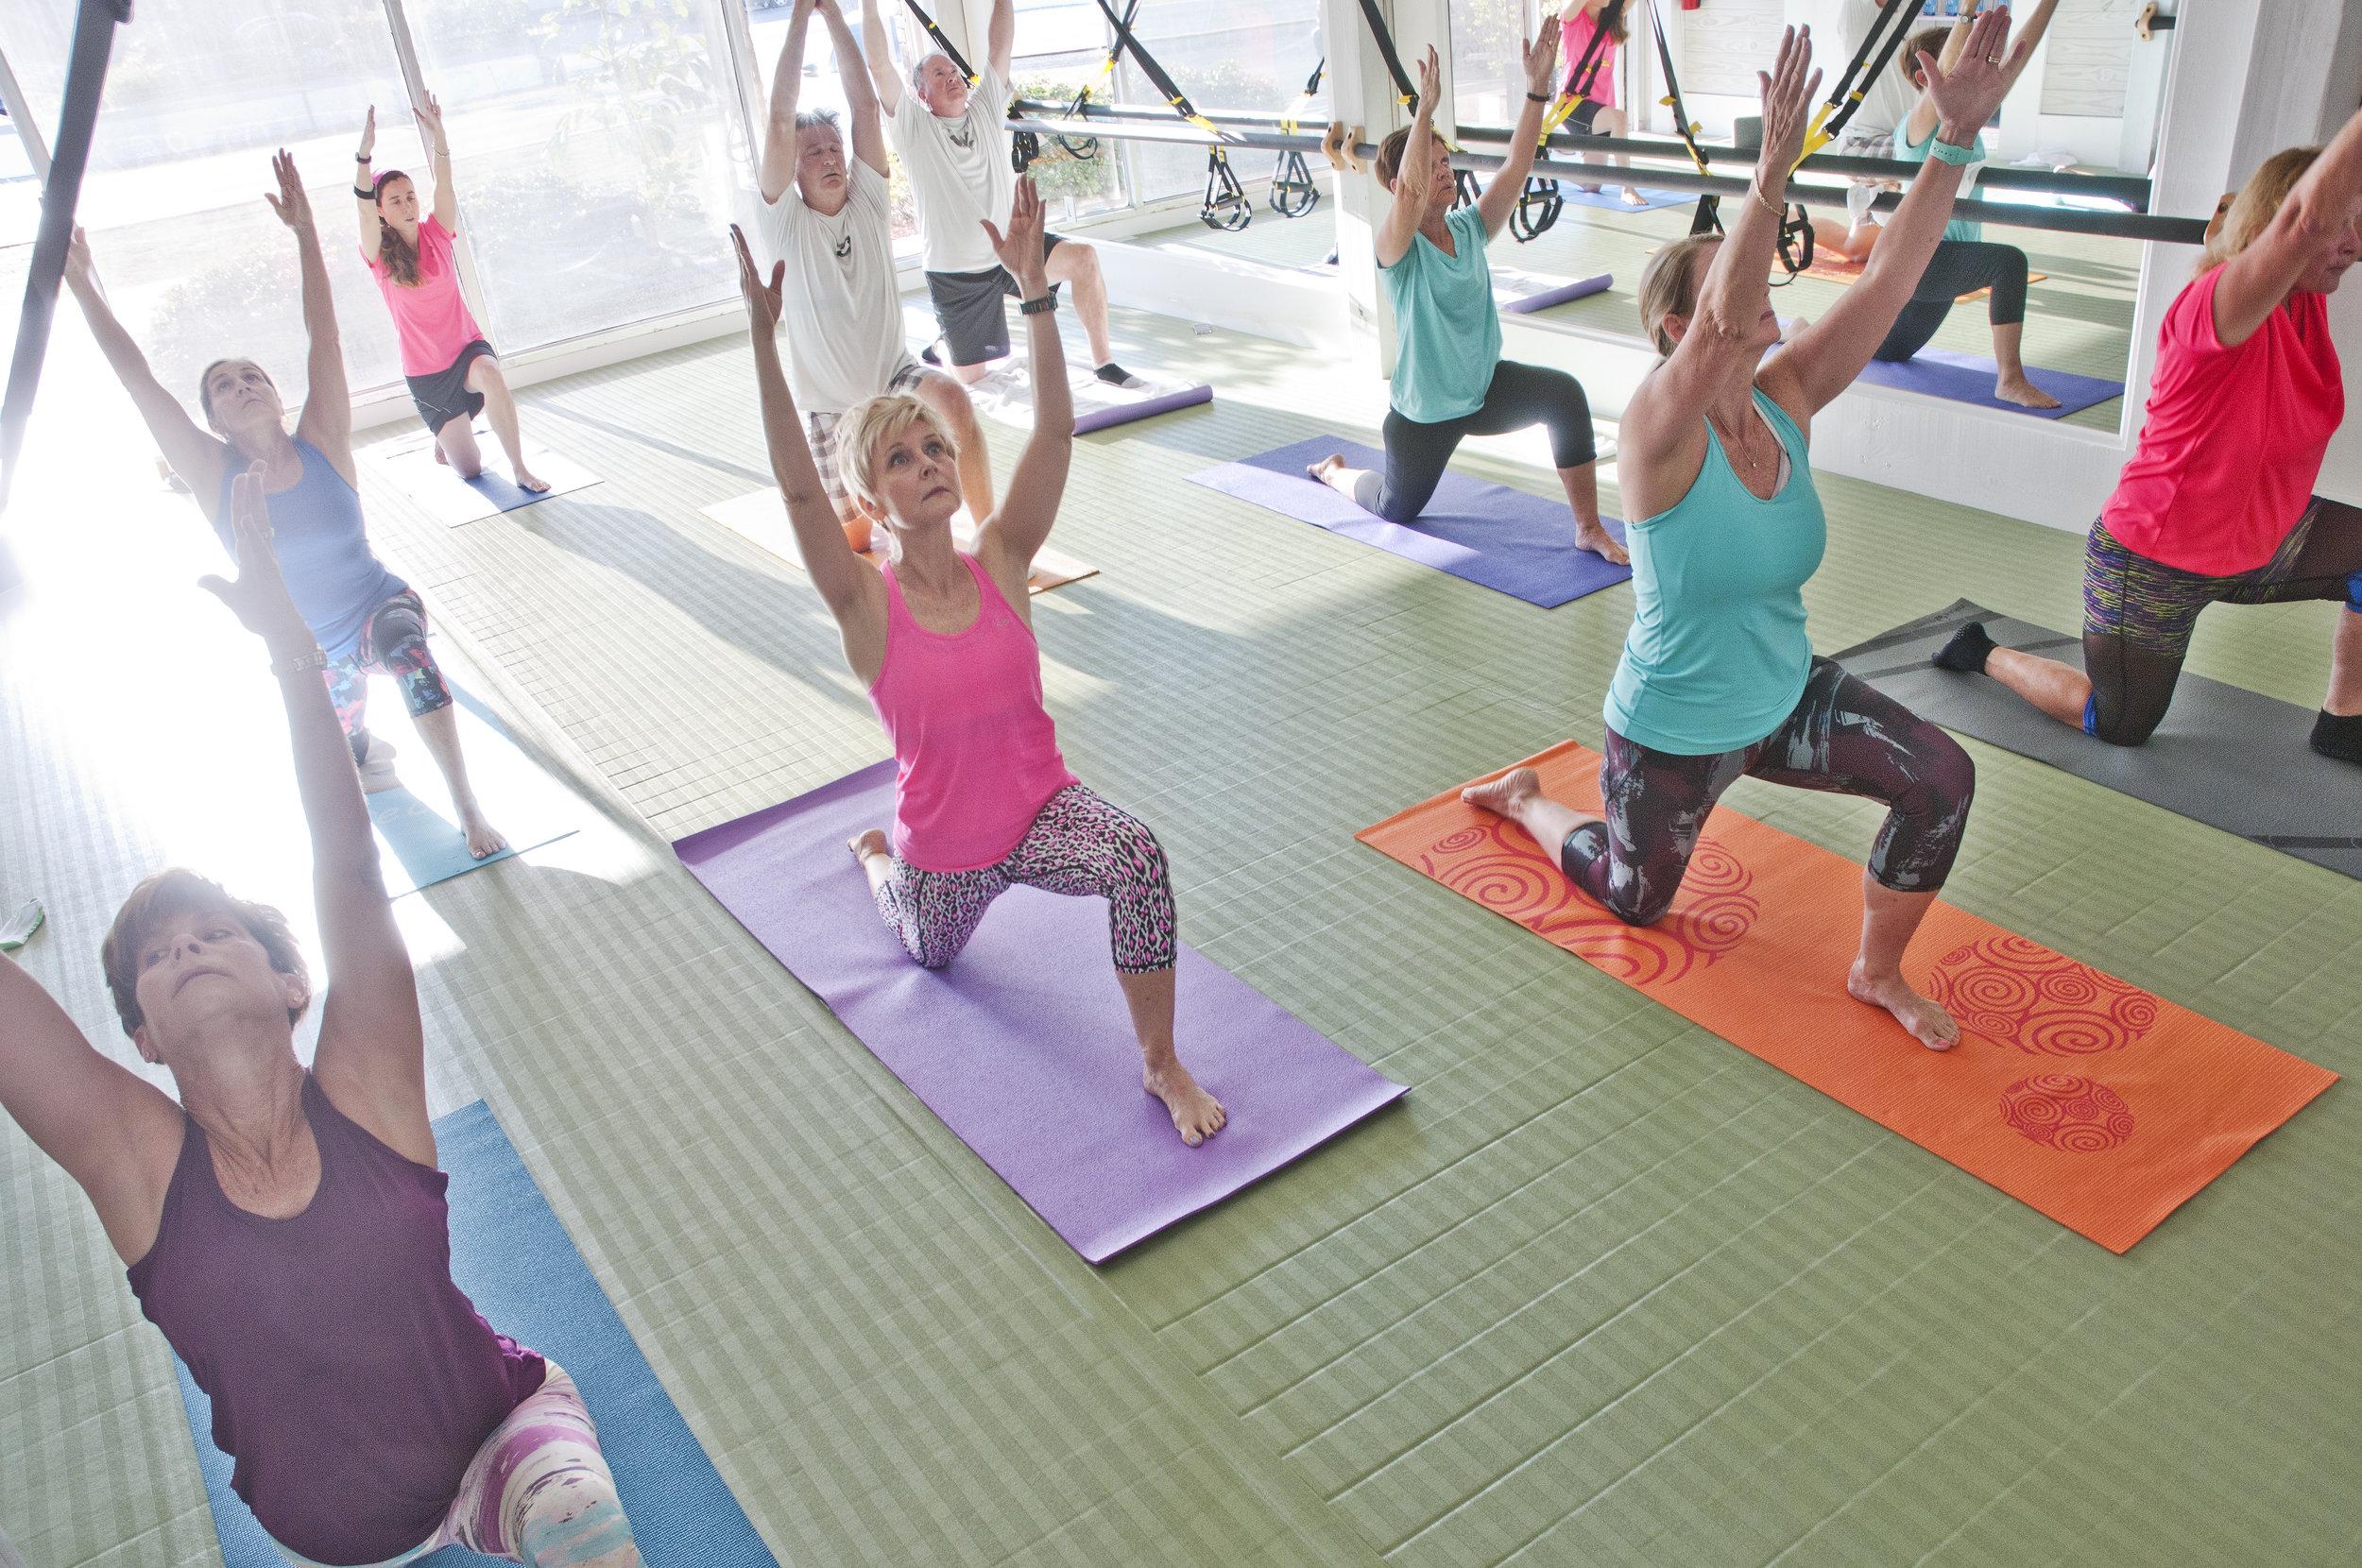 Yoga-Studio-Classes.jpg